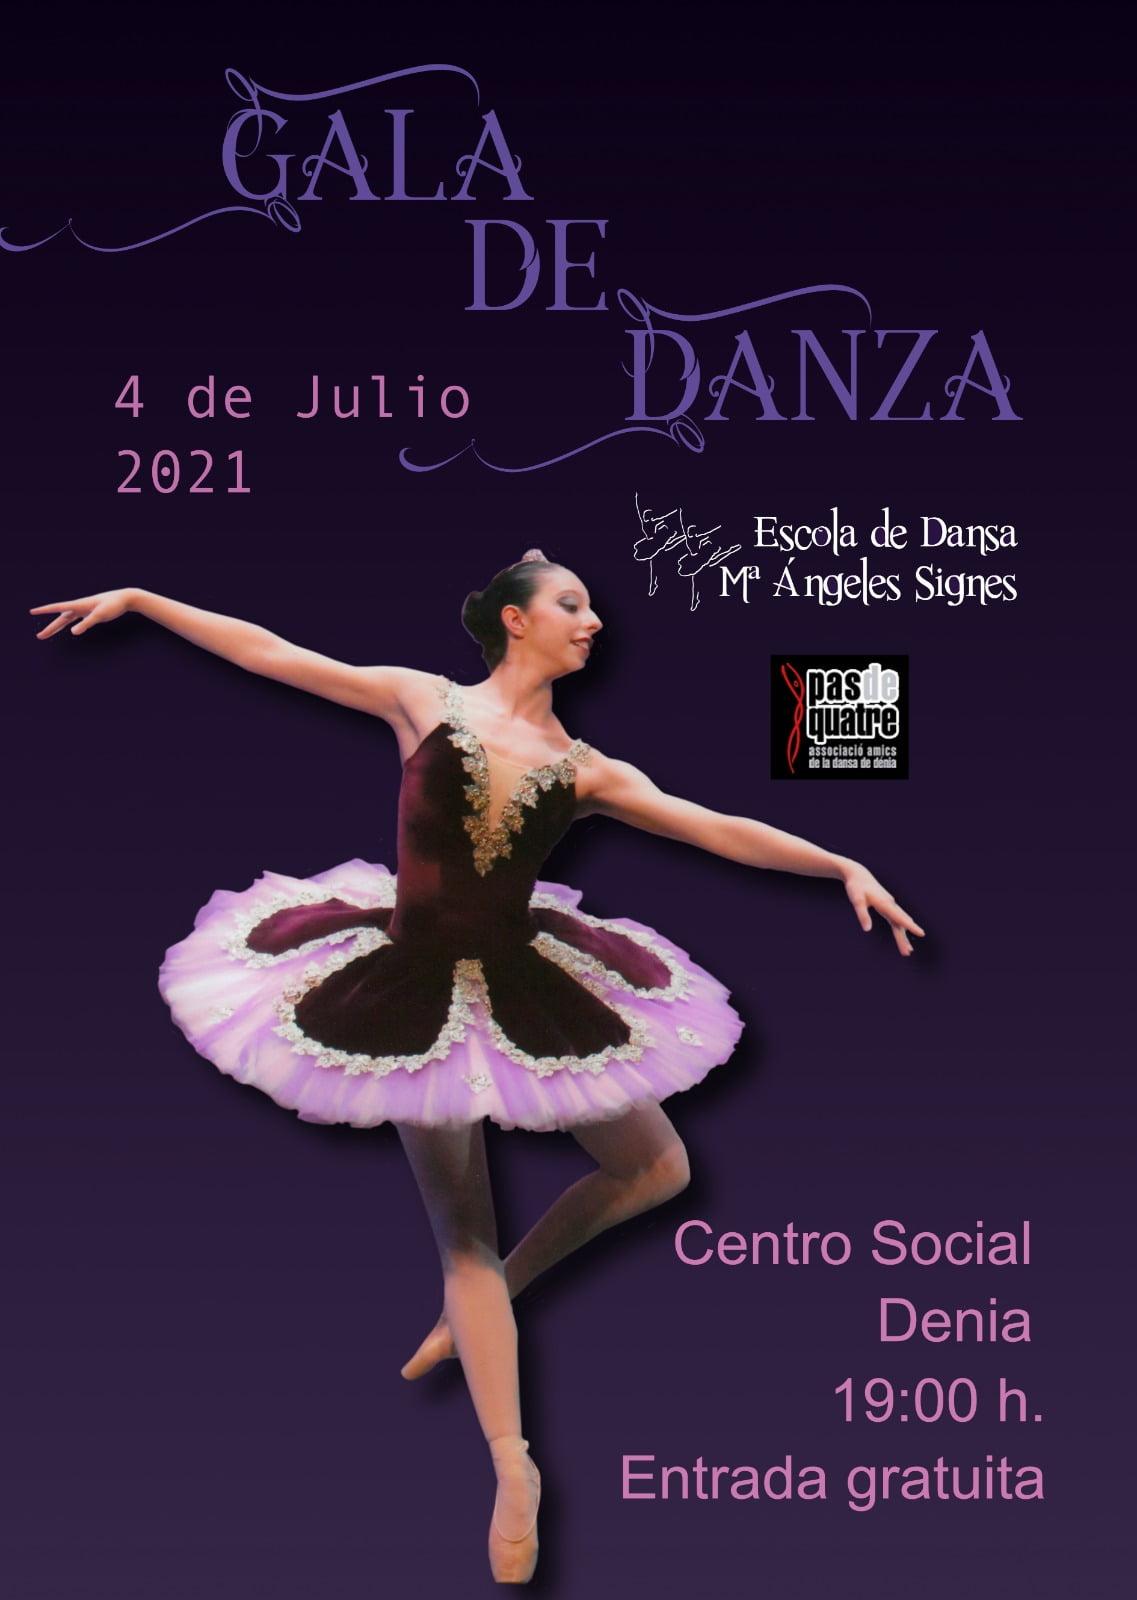 Gala de danza 2021 – Escola de Dansa Mª Ángeles Signes